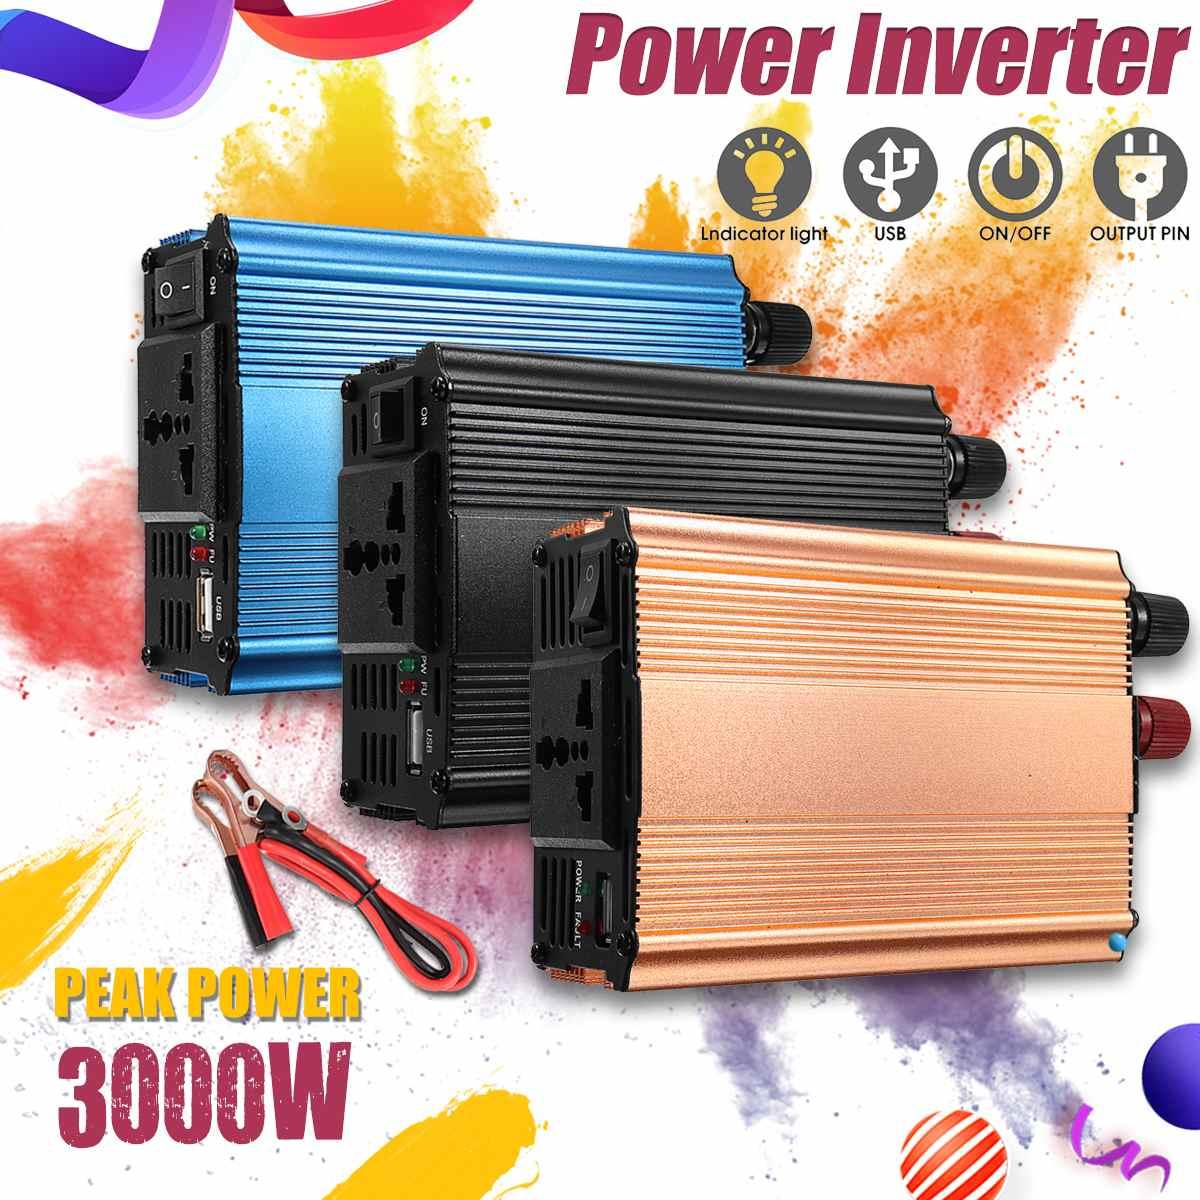 KROAK Inverter 12V 220V 3000W Pea Car Power Inverter Voltage Transformer Converter 12 220 Charger Solar Inversor 12V 220VKROAK Inverter 12V 220V 3000W Pea Car Power Inverter Voltage Transformer Converter 12 220 Charger Solar Inversor 12V 220V